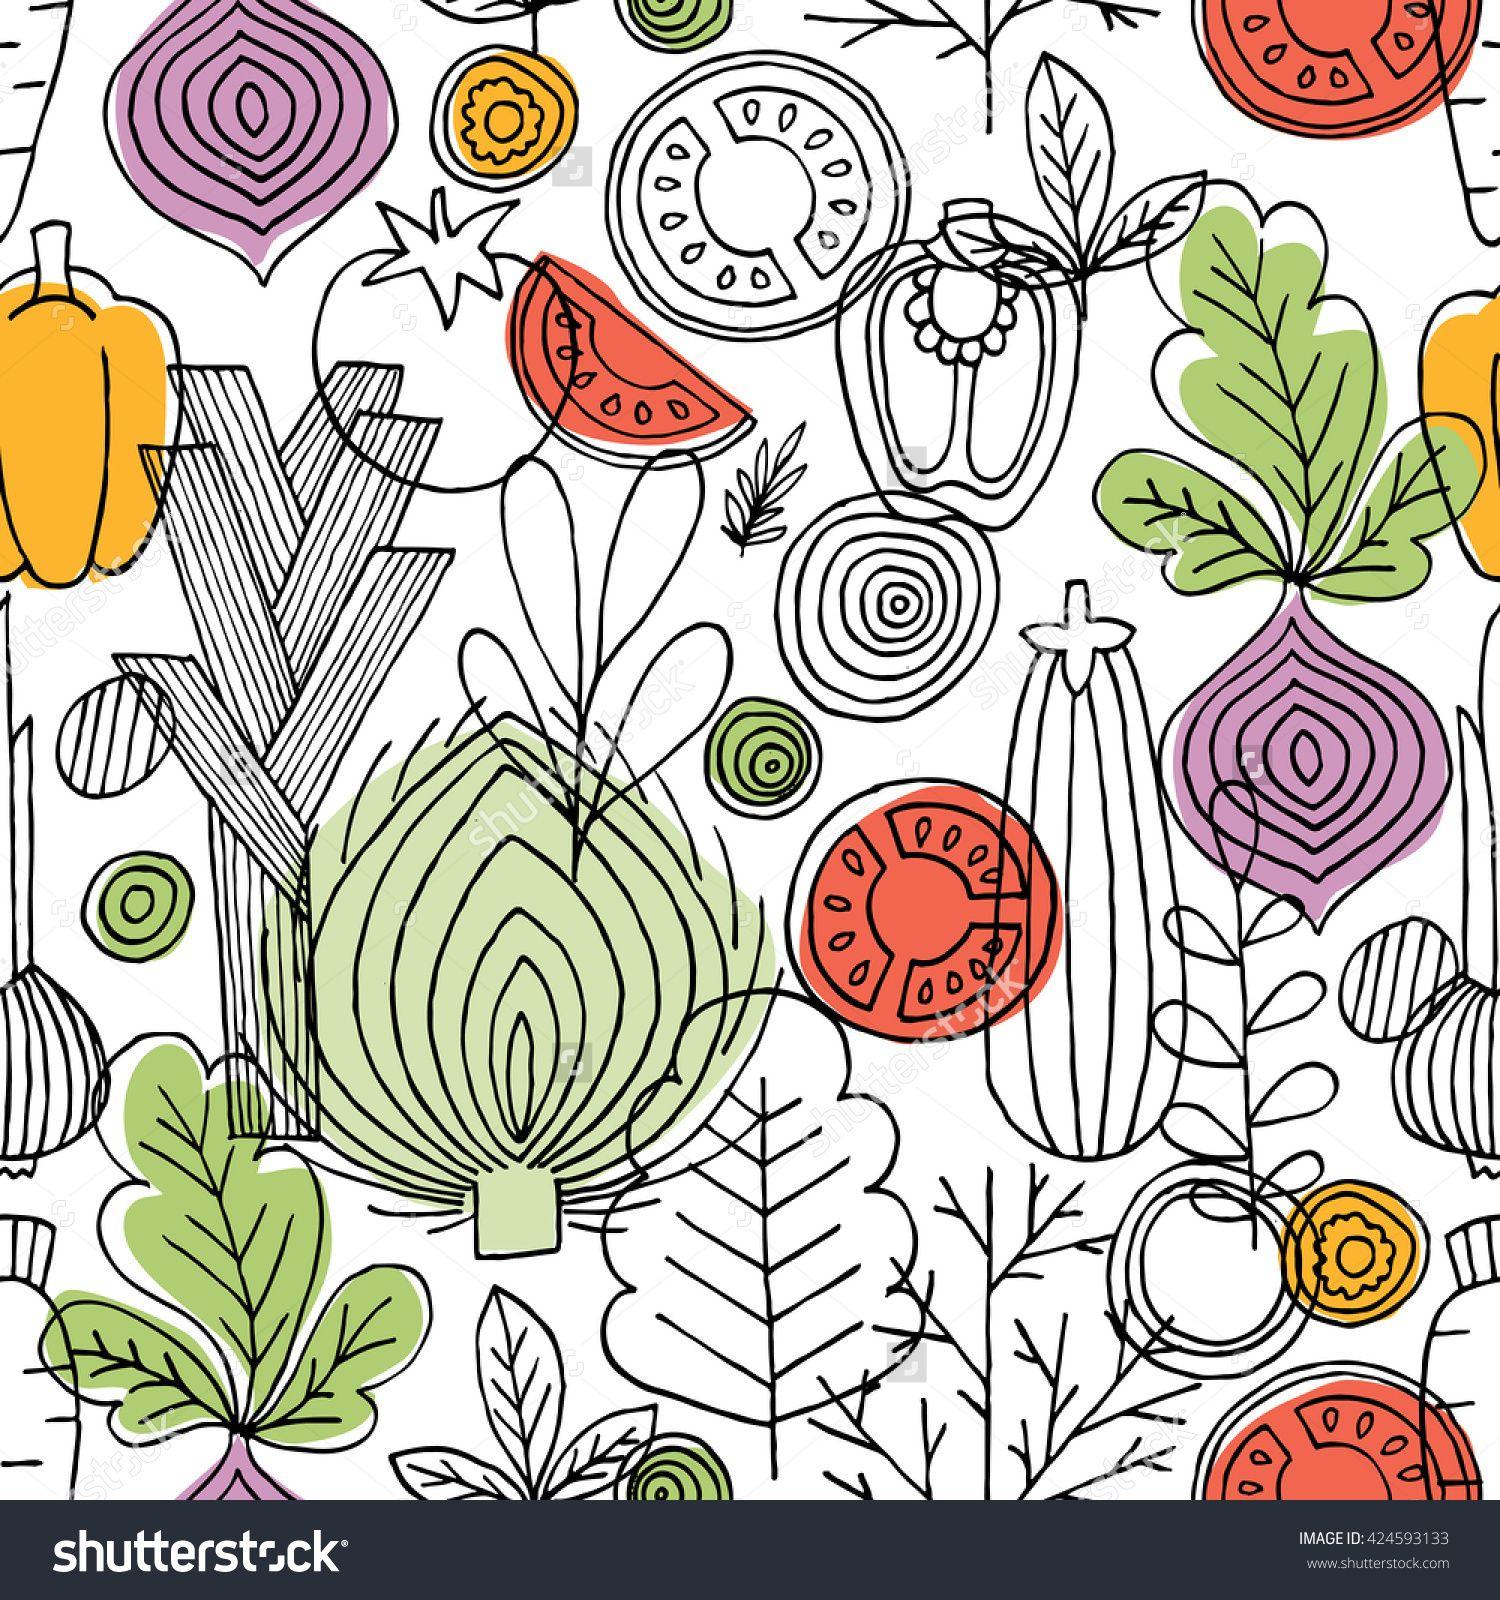 Vegetables Seamless Pattern Linear Graphic Background Electric Circuit Symbol Element Set Illustration Vectorielle Libre De Scandinavian Style Healthy Food Vector